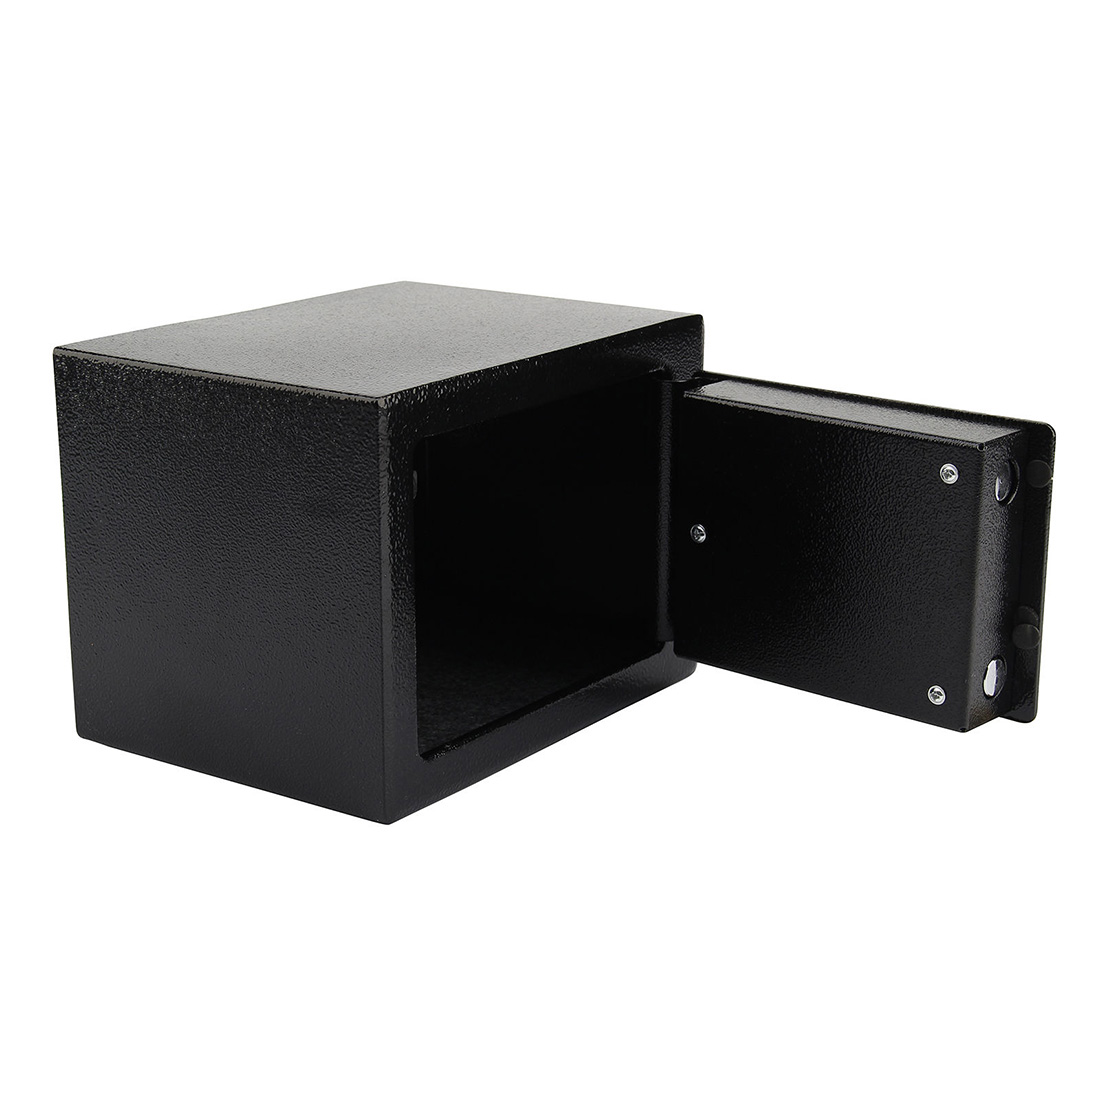 high security safes key lock safety strong steel box home office money cash g8t7 ebay. Black Bedroom Furniture Sets. Home Design Ideas